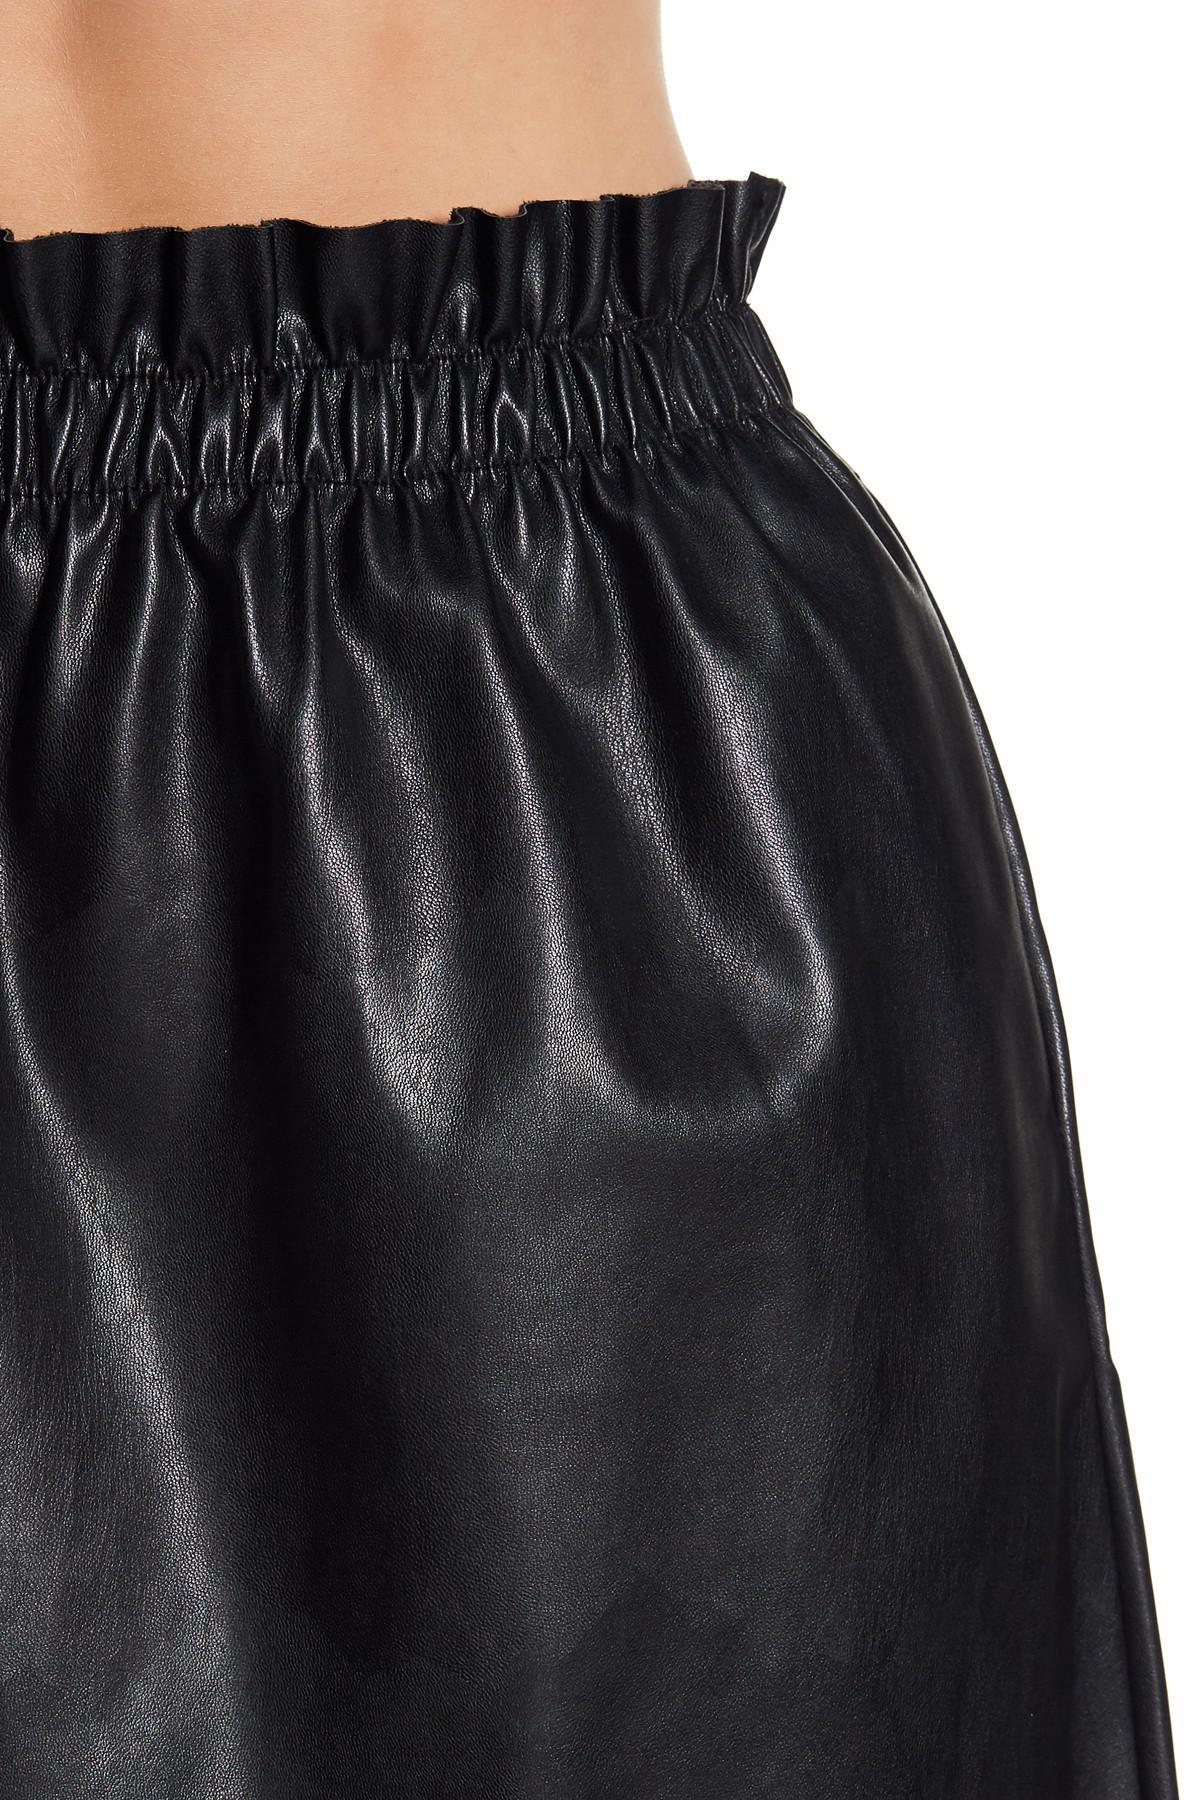 terrific value diverse styles store Dex Black Pull On Faux Leather Mini Skirt